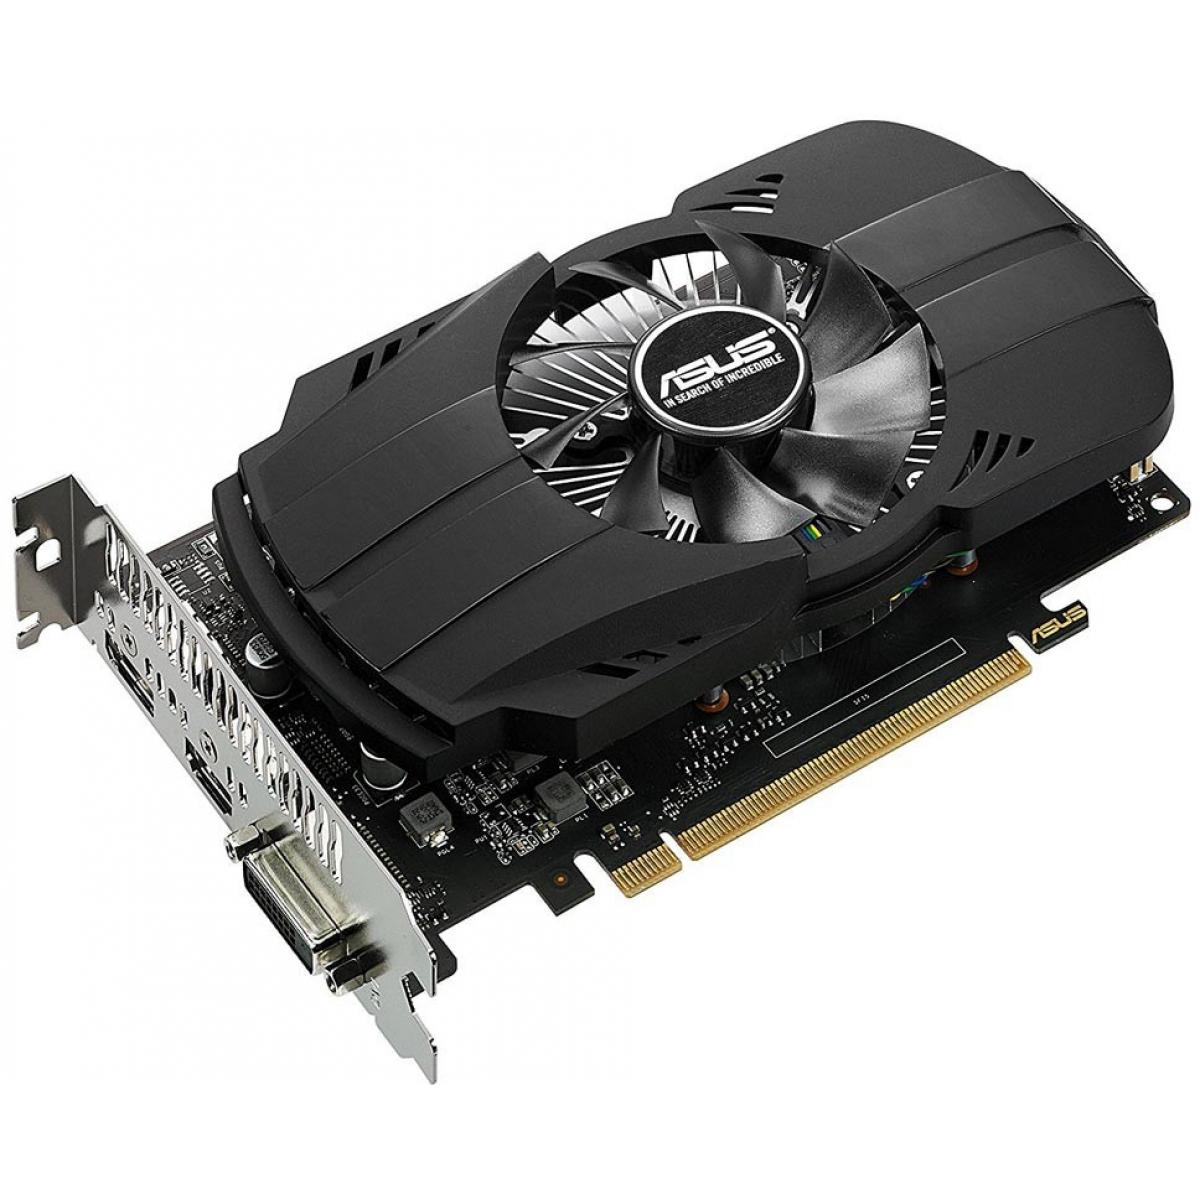 Placa de Vídeo Asus GeForce GTX 1050 TI 4GB PH-GTX1050 TI-4G GDDR5 PCI-EXP